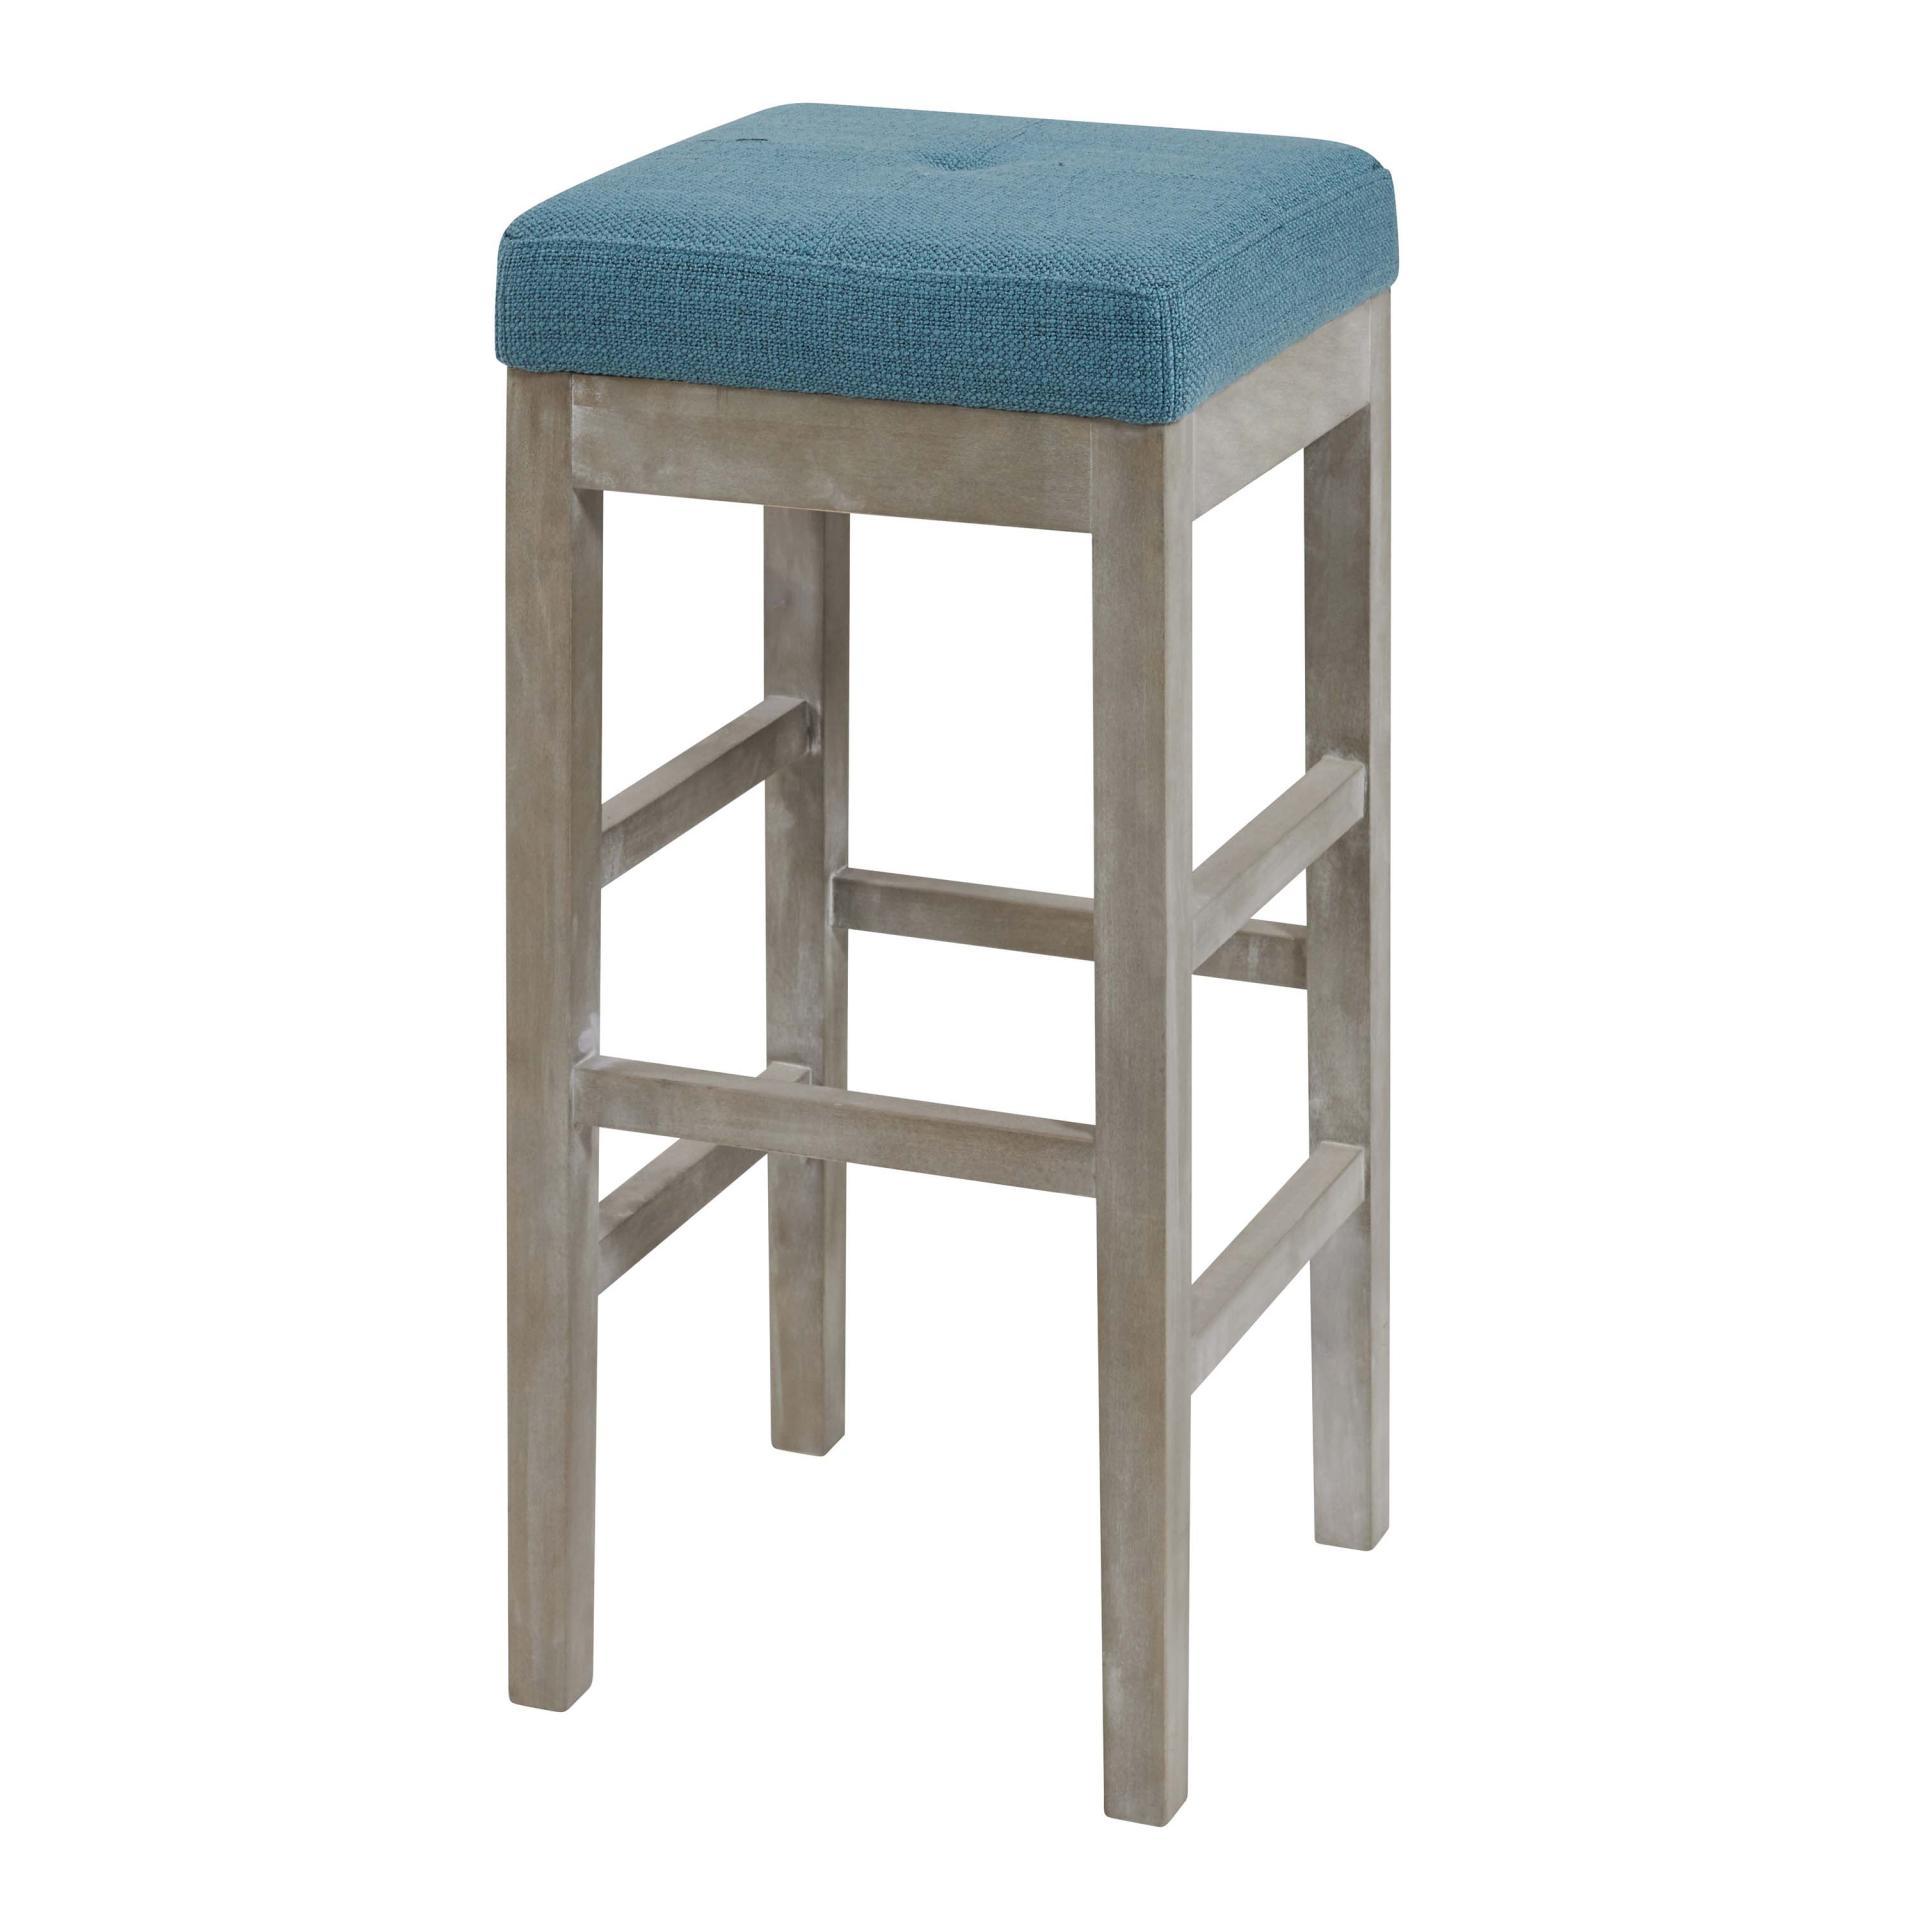 108631 111 Npd Furniture Wholesale Lifestyle Furniture